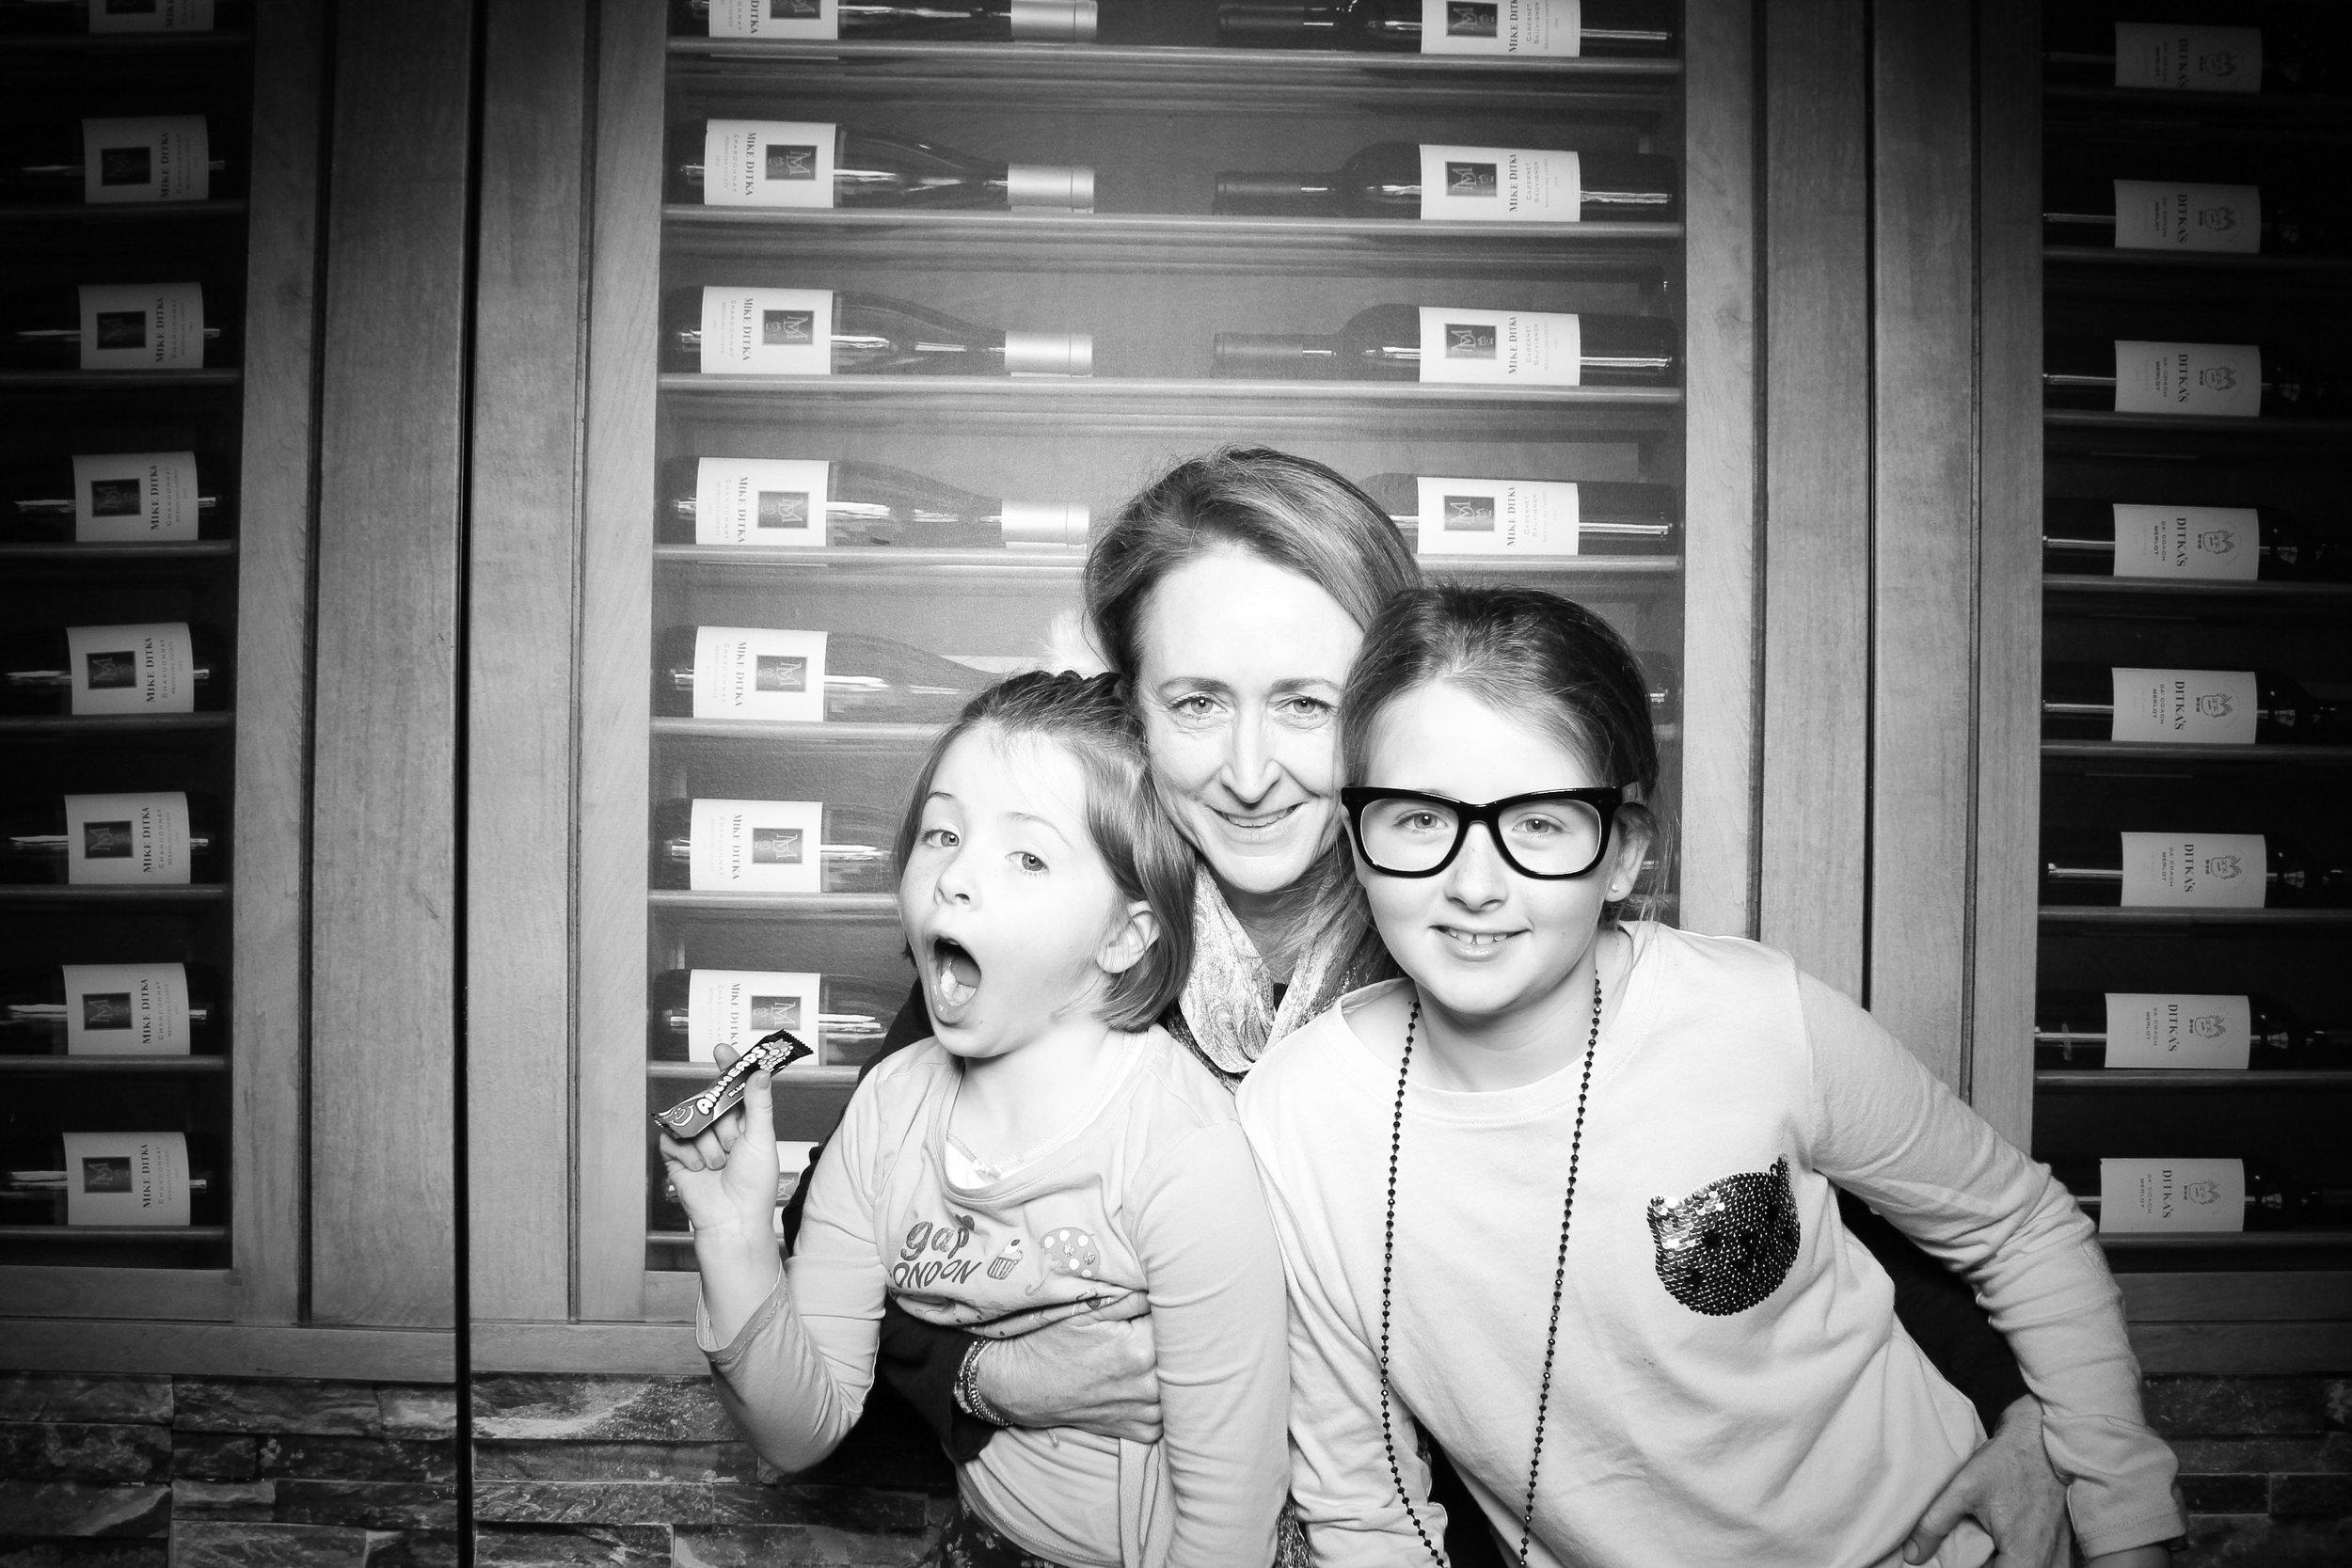 Chicago_Vintage_Photobooth_Ditkas_Birthday_Party_25.jpg